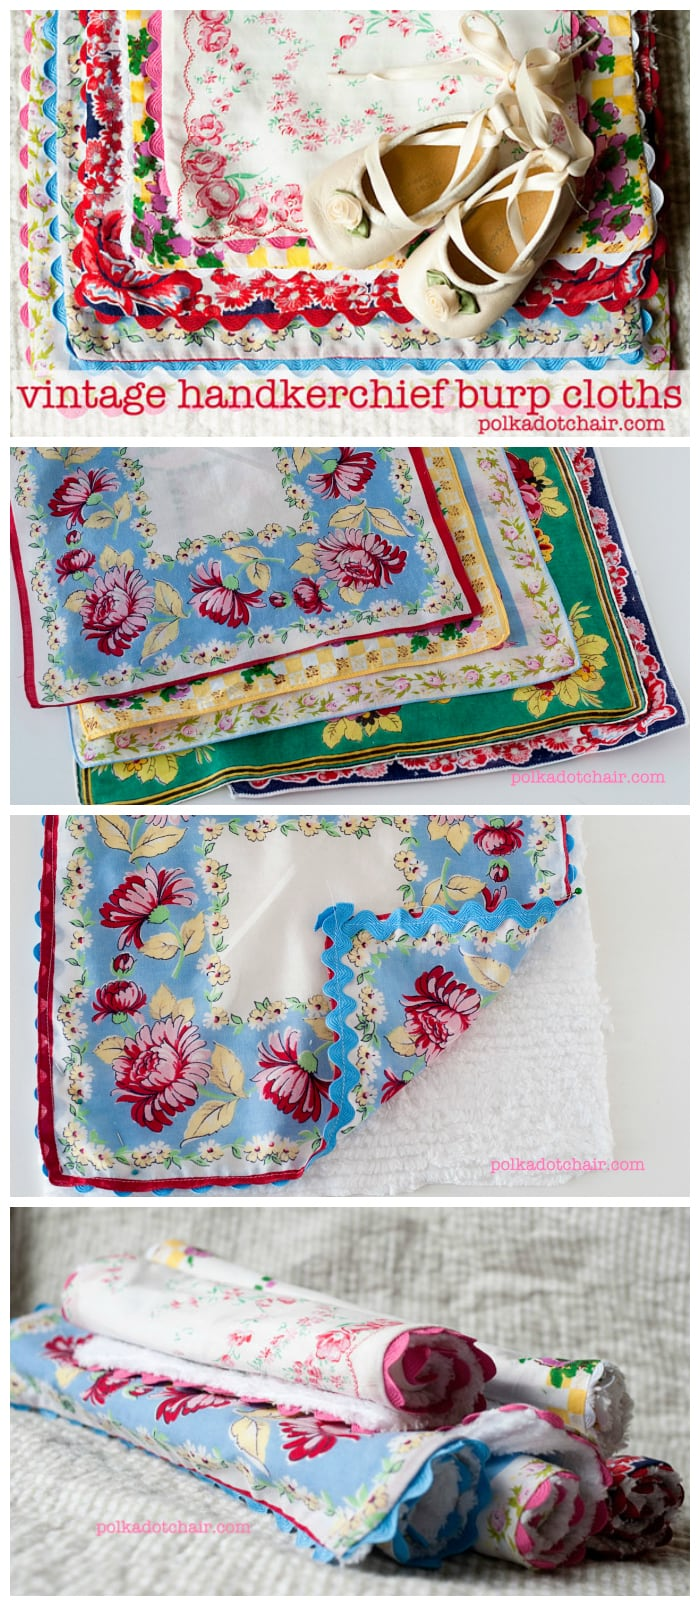 Burp Cloths made from Vintage Handkerchiefs